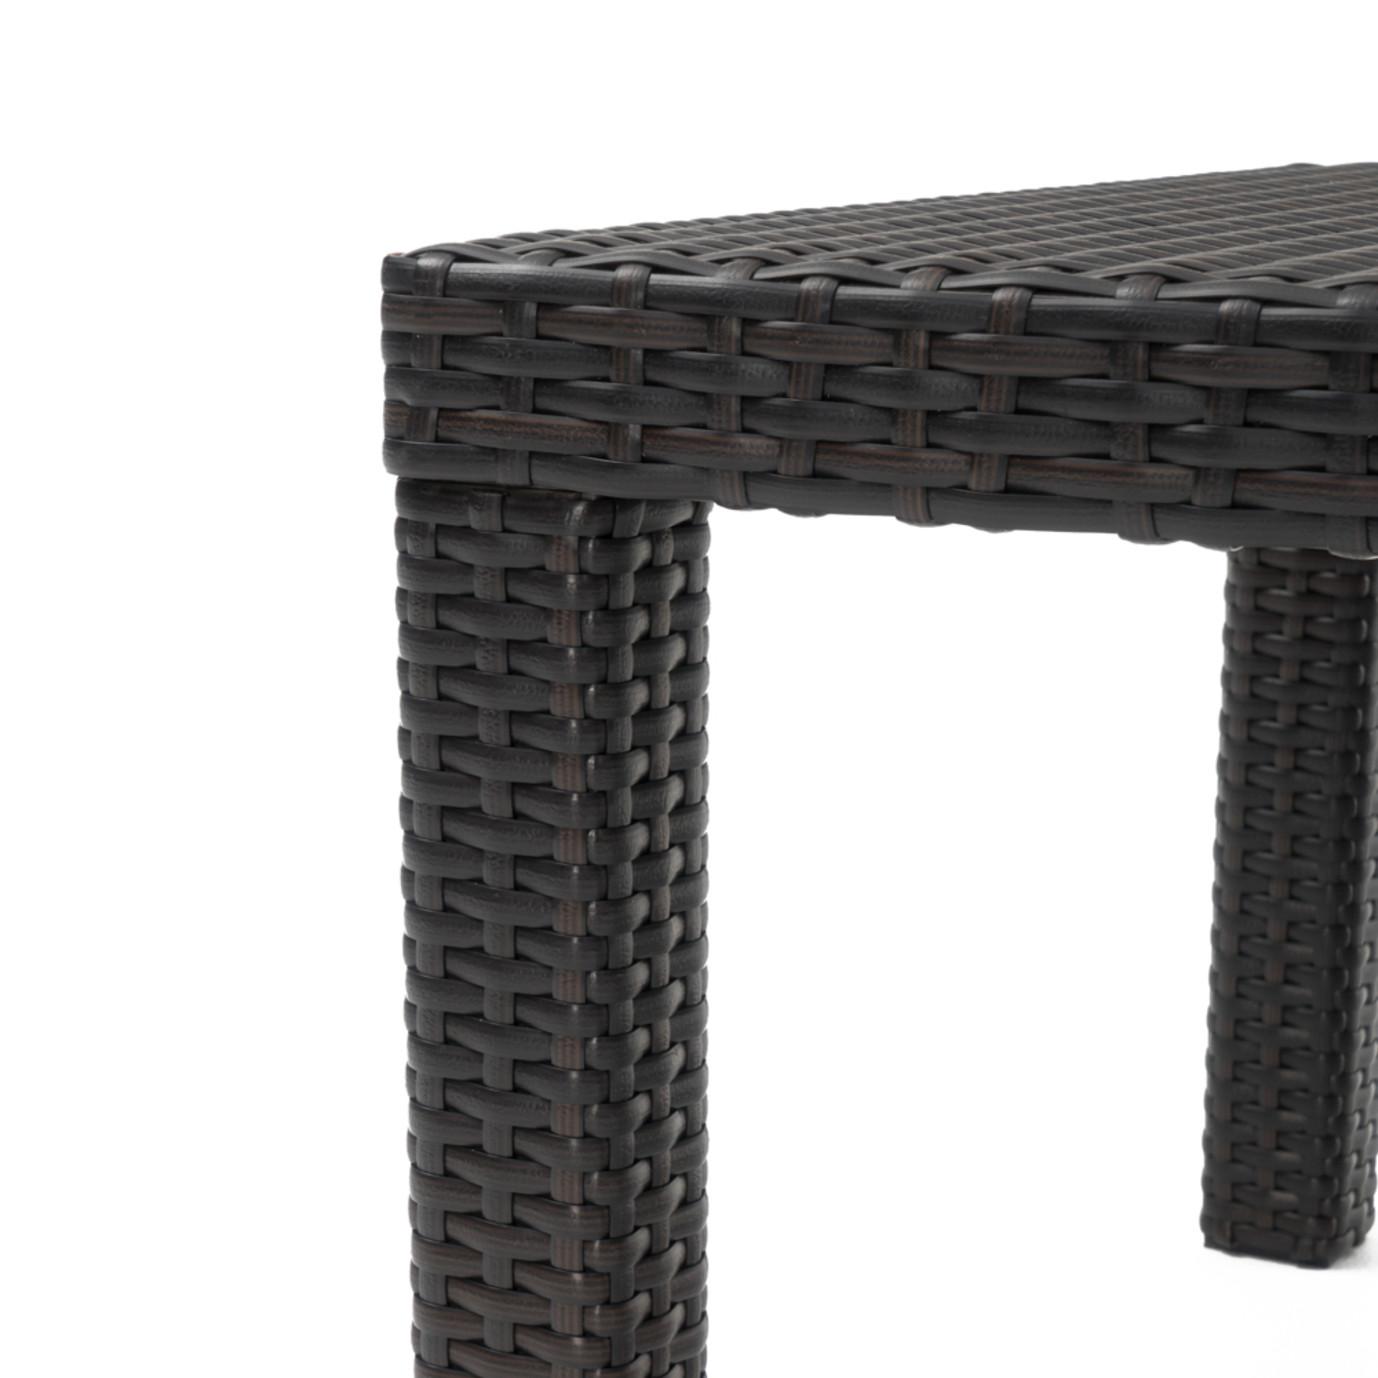 Deco™ Sofa with Coffee Table - Slate Grey